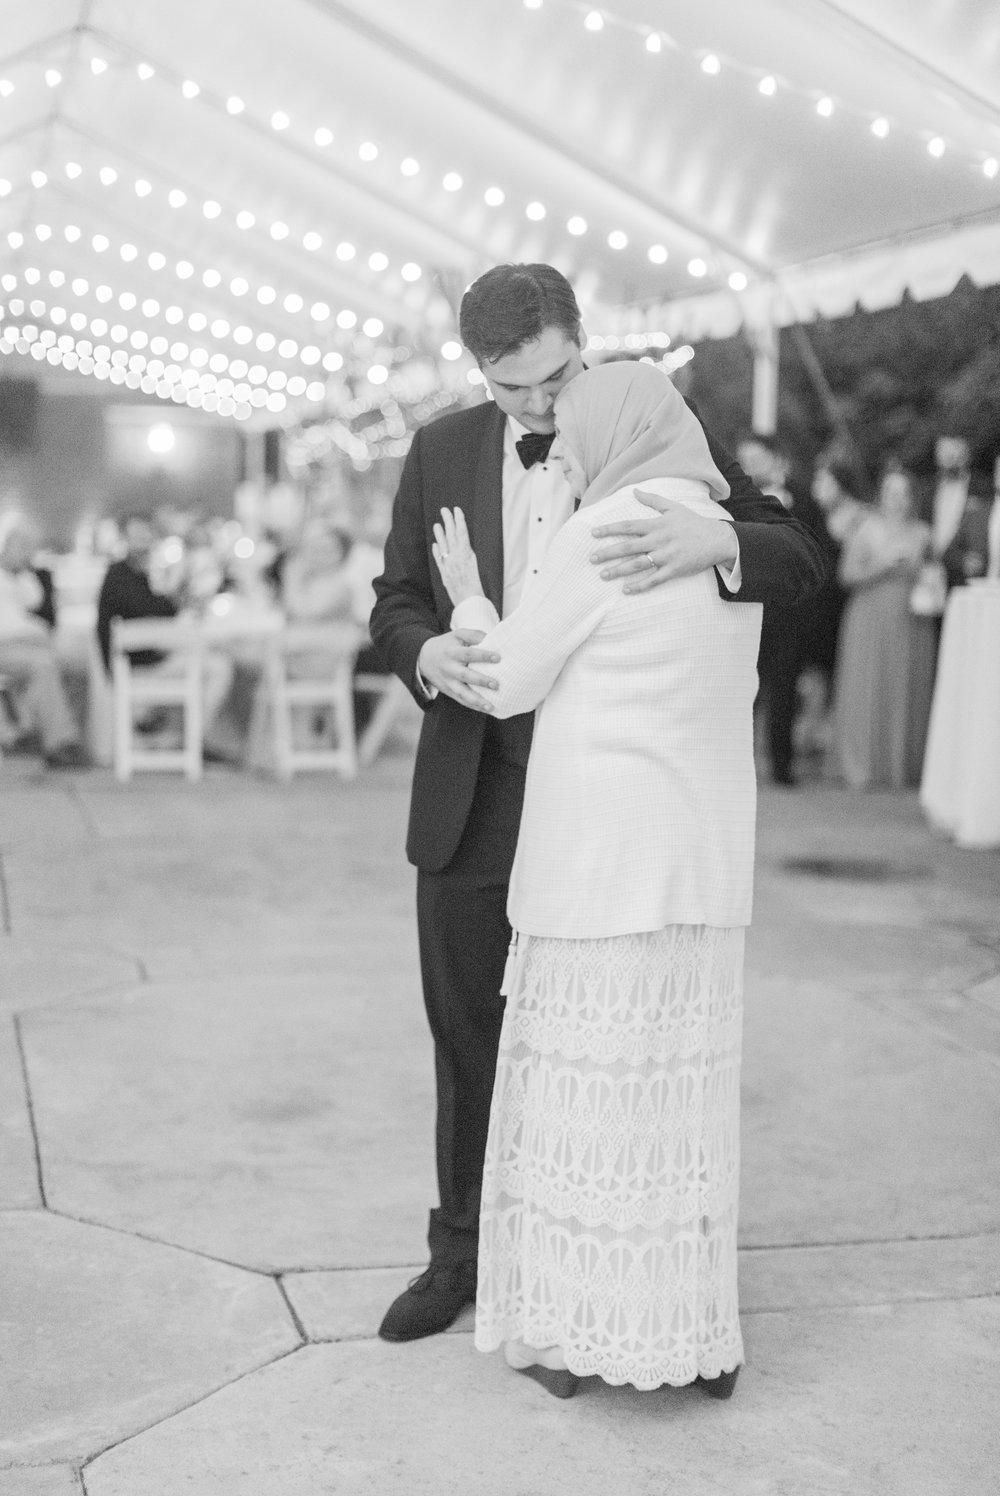 memphis-wedding-hunt-phelan 61.jpg